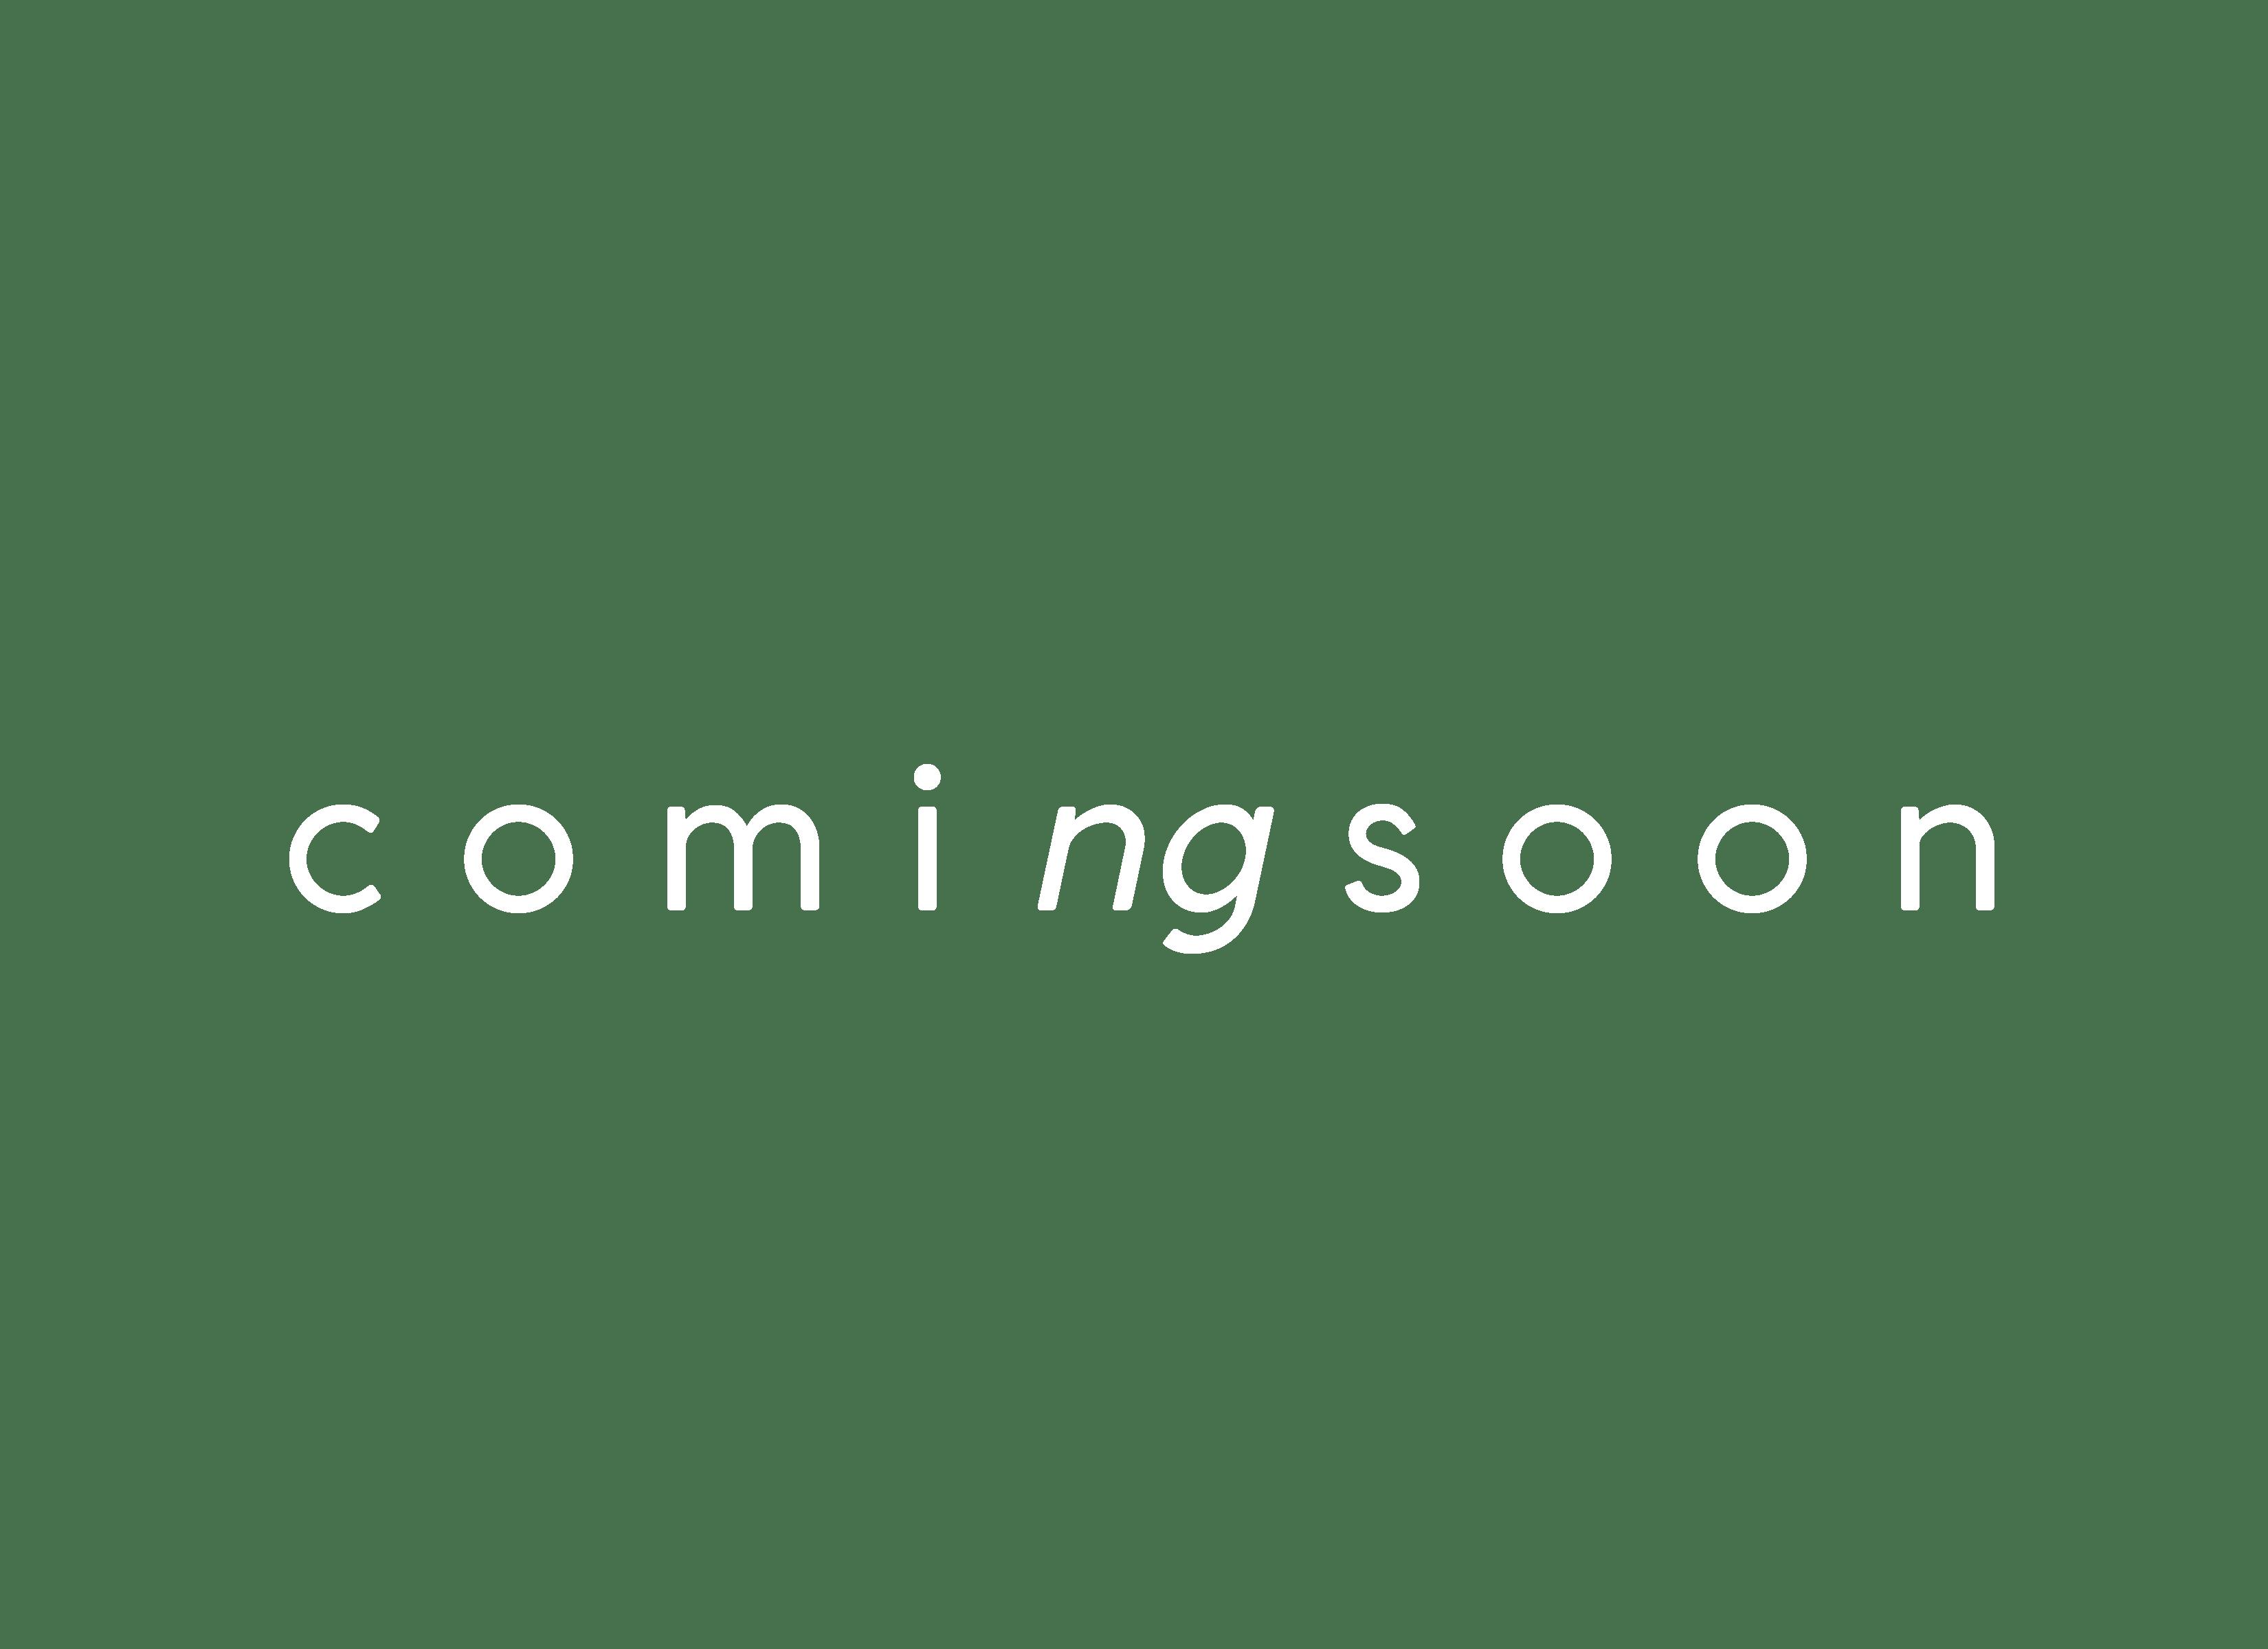 coming soon 03